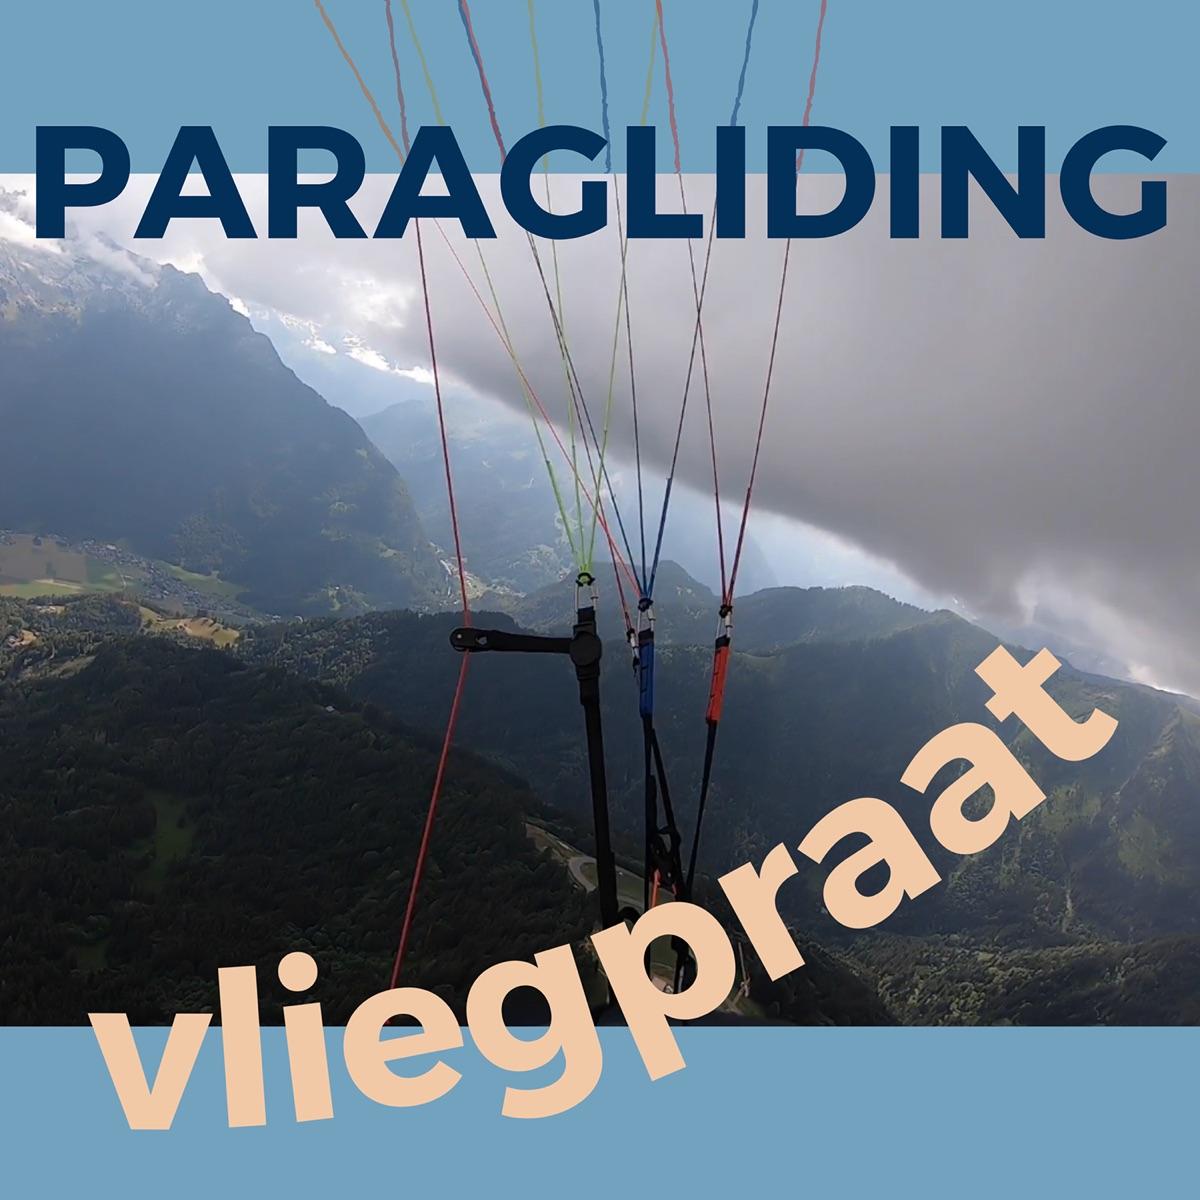 Paragliding Vliegpraat